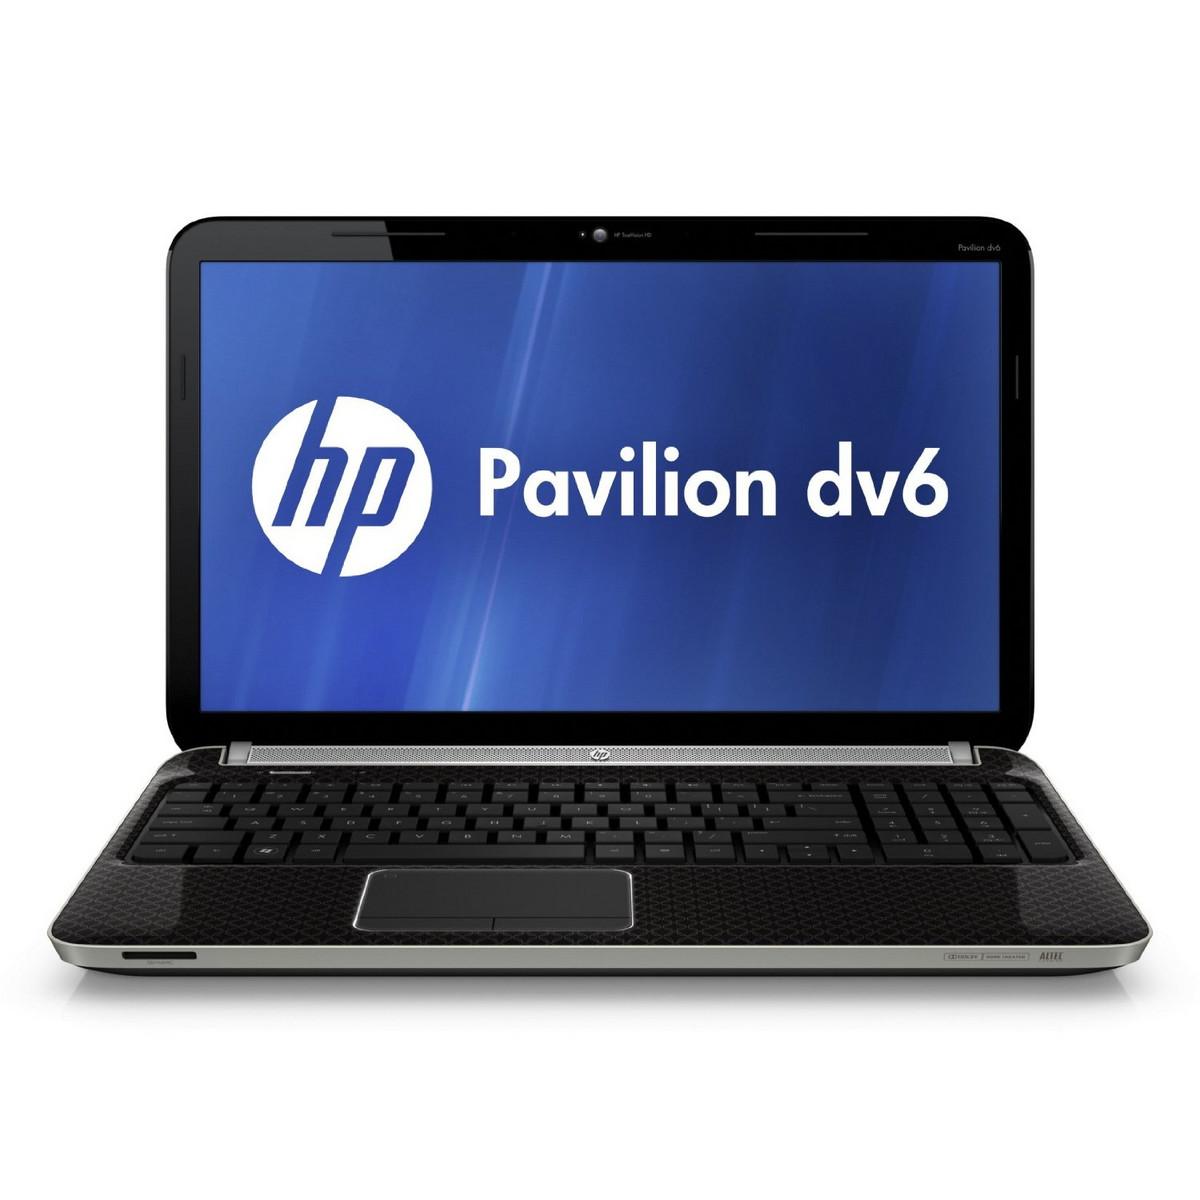 HP Pavilion dv6 - Disassembly - YouTube